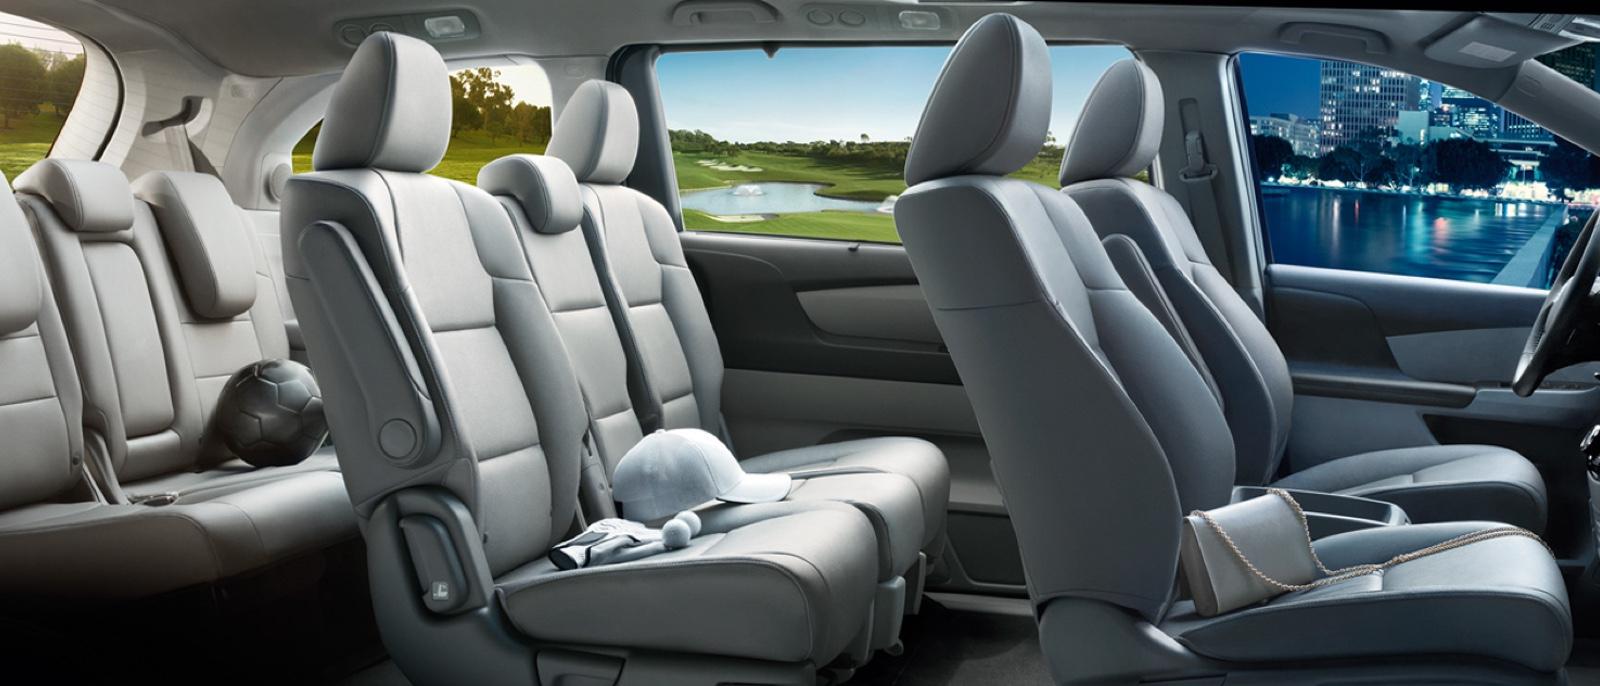 The 2016 Honda Odyssey Interior Space Vs Other Minivans